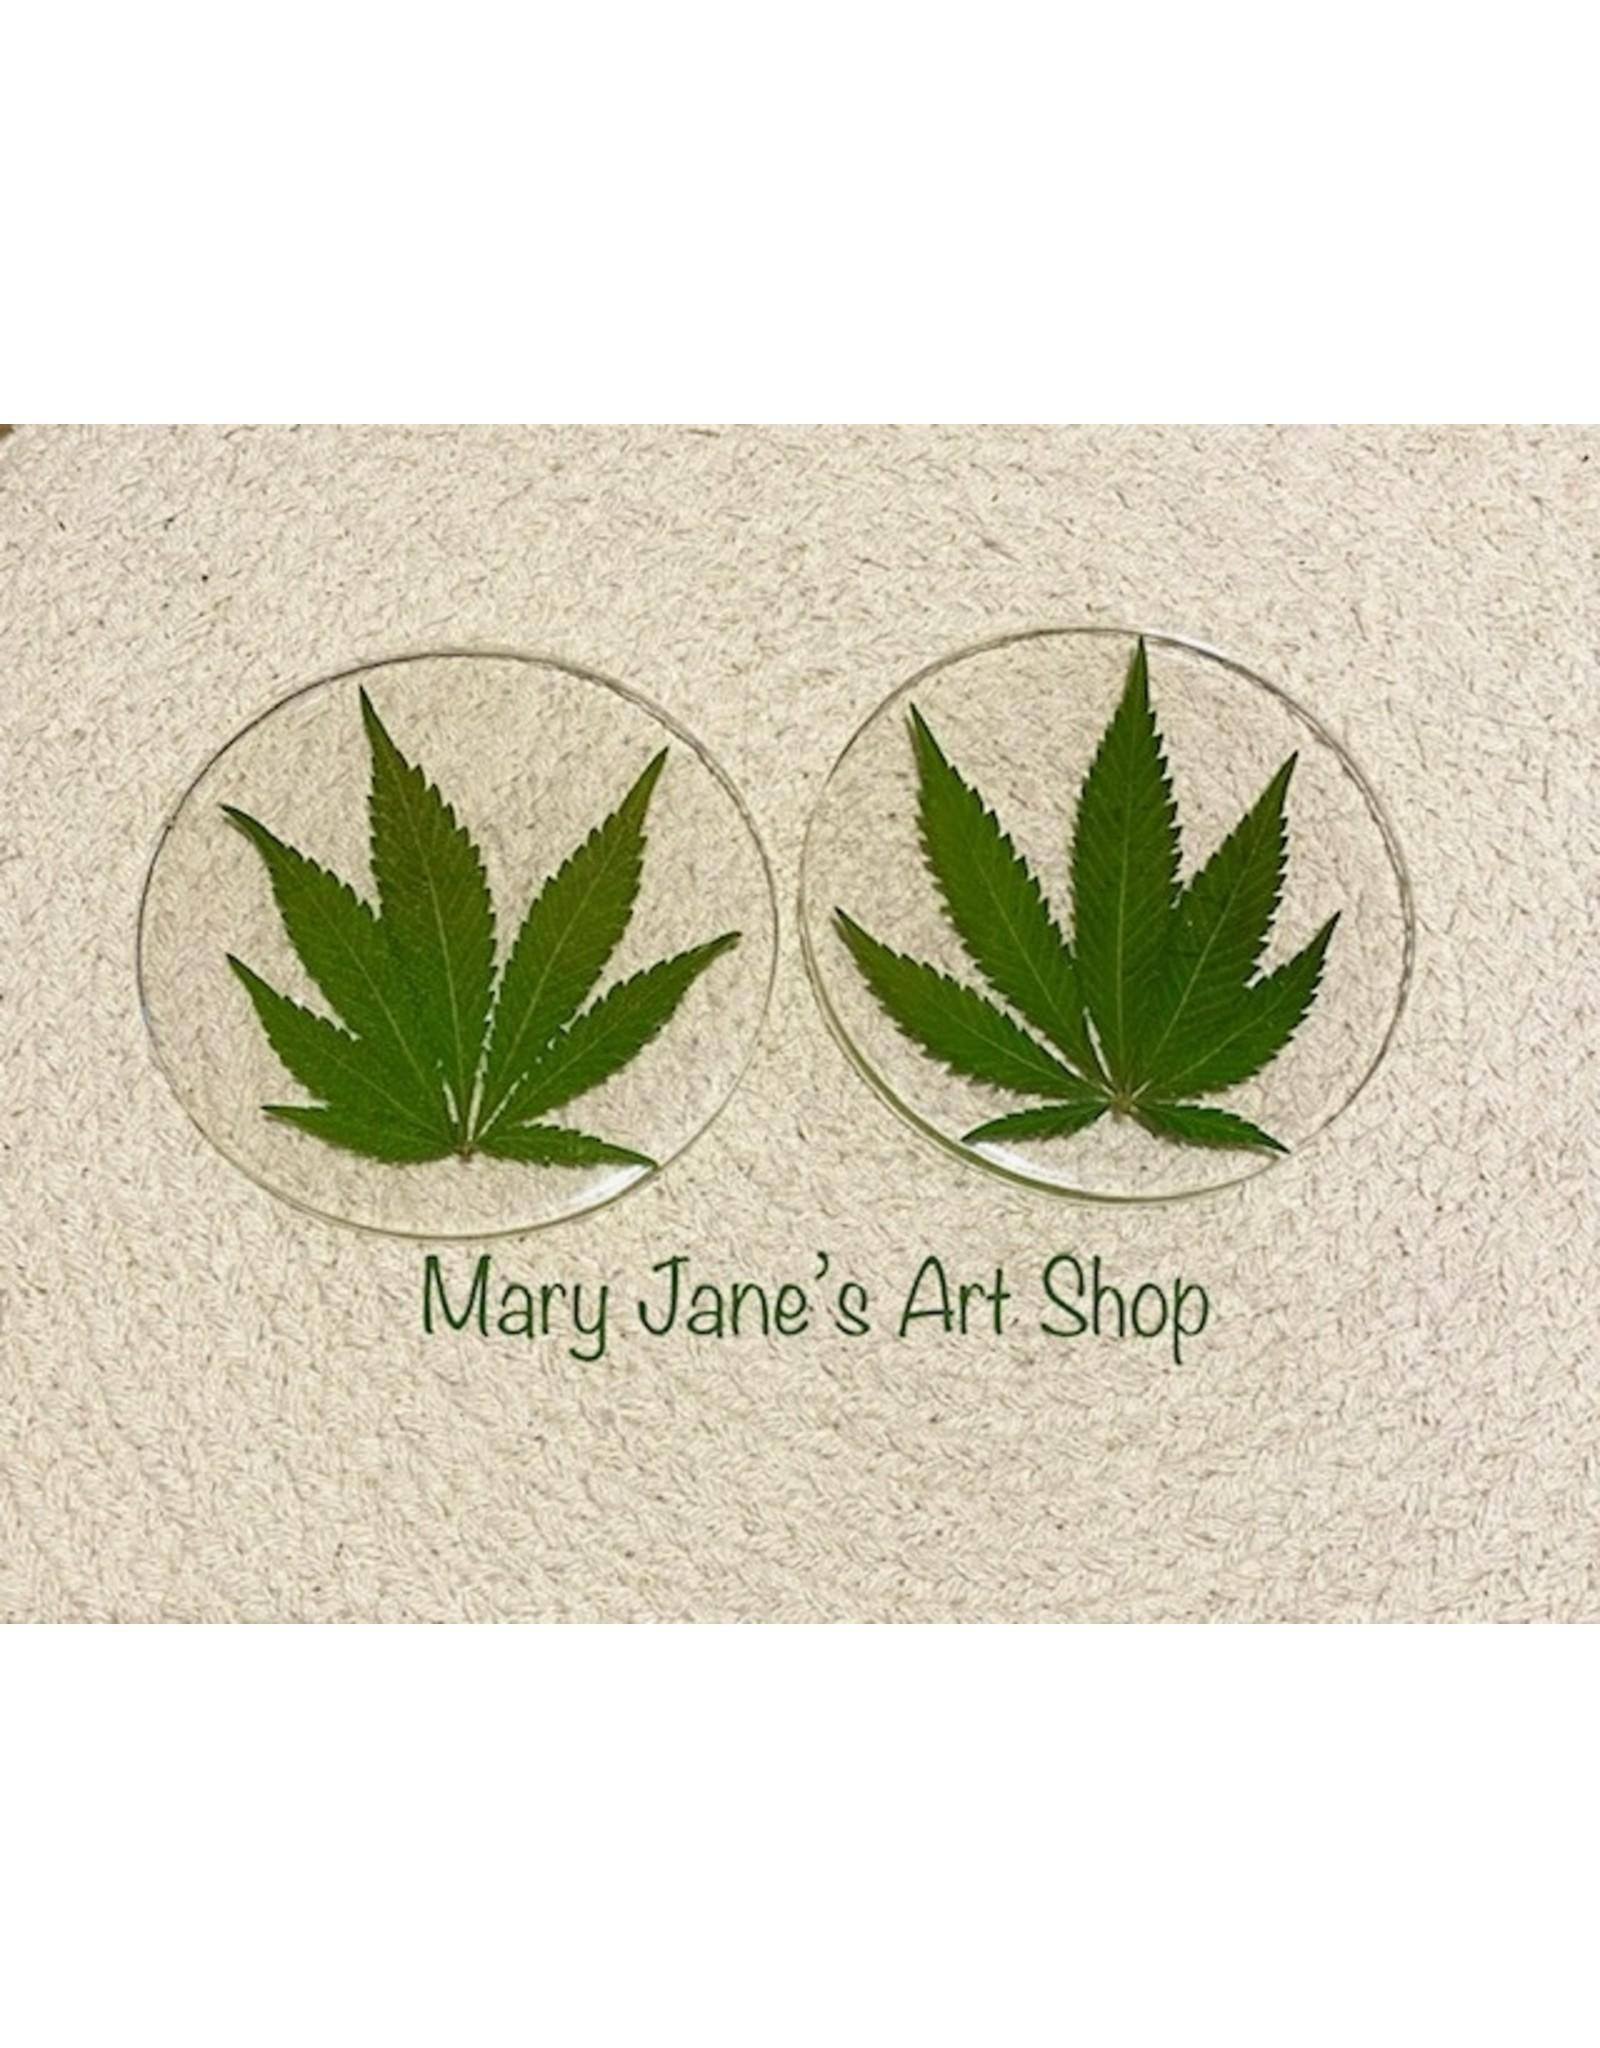 Mary Jane's Art Shop Mary Jane's Clear Leaf Coaster